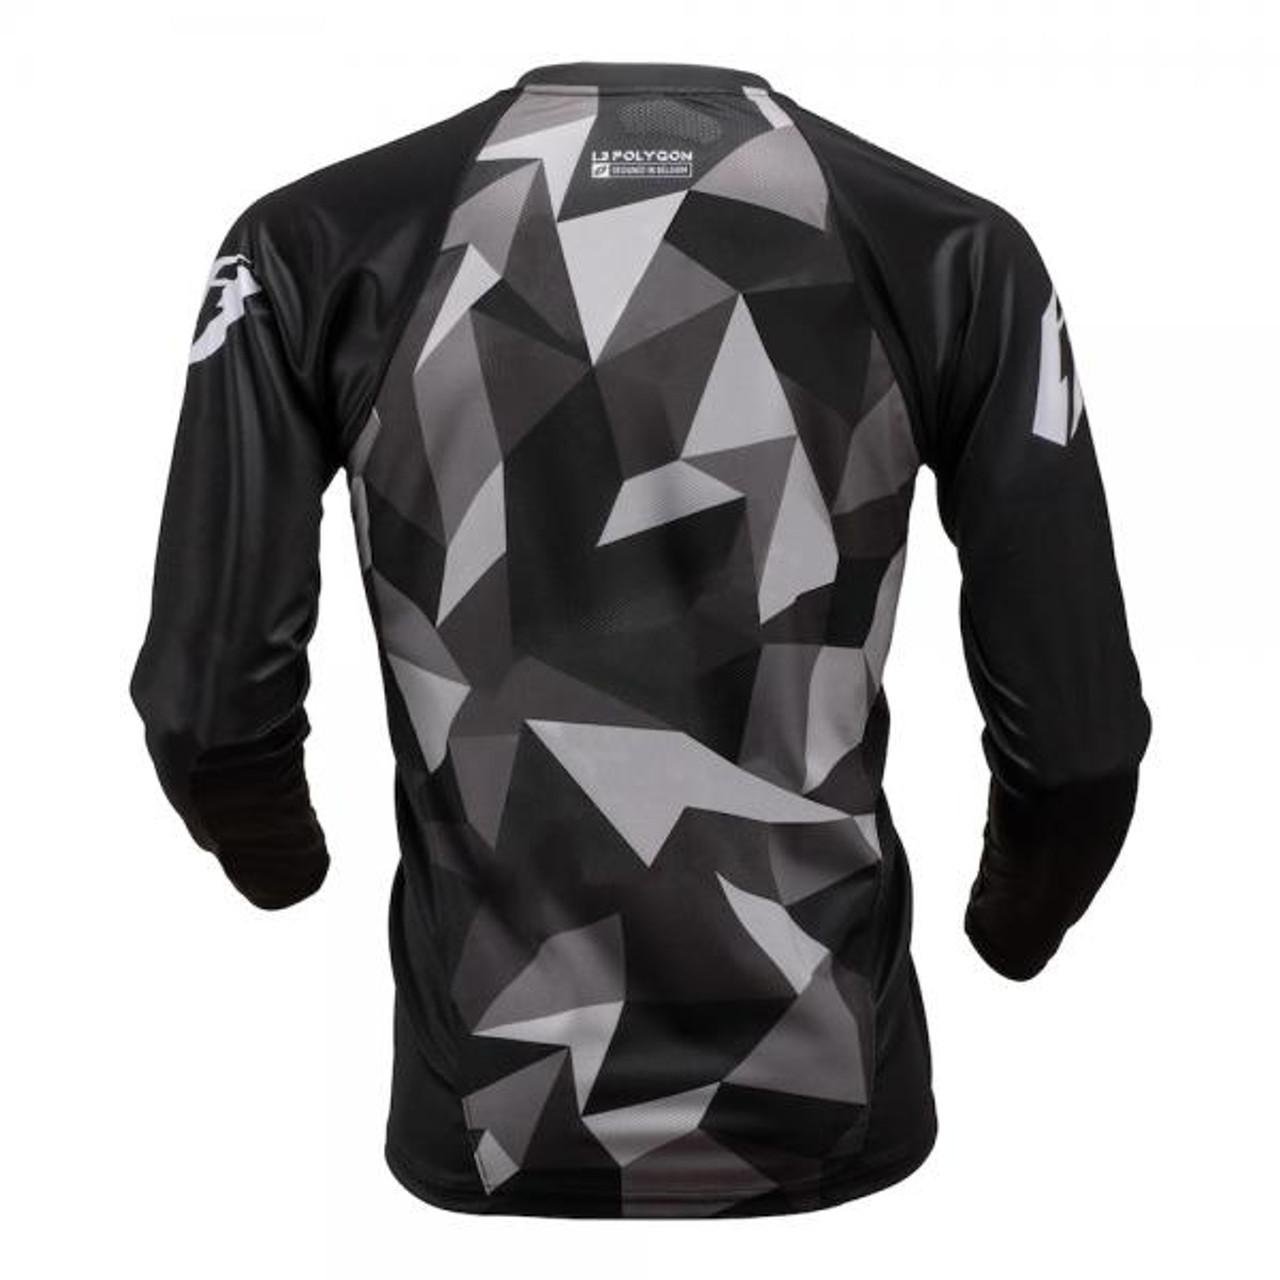 Jersey L3 Polygon, back